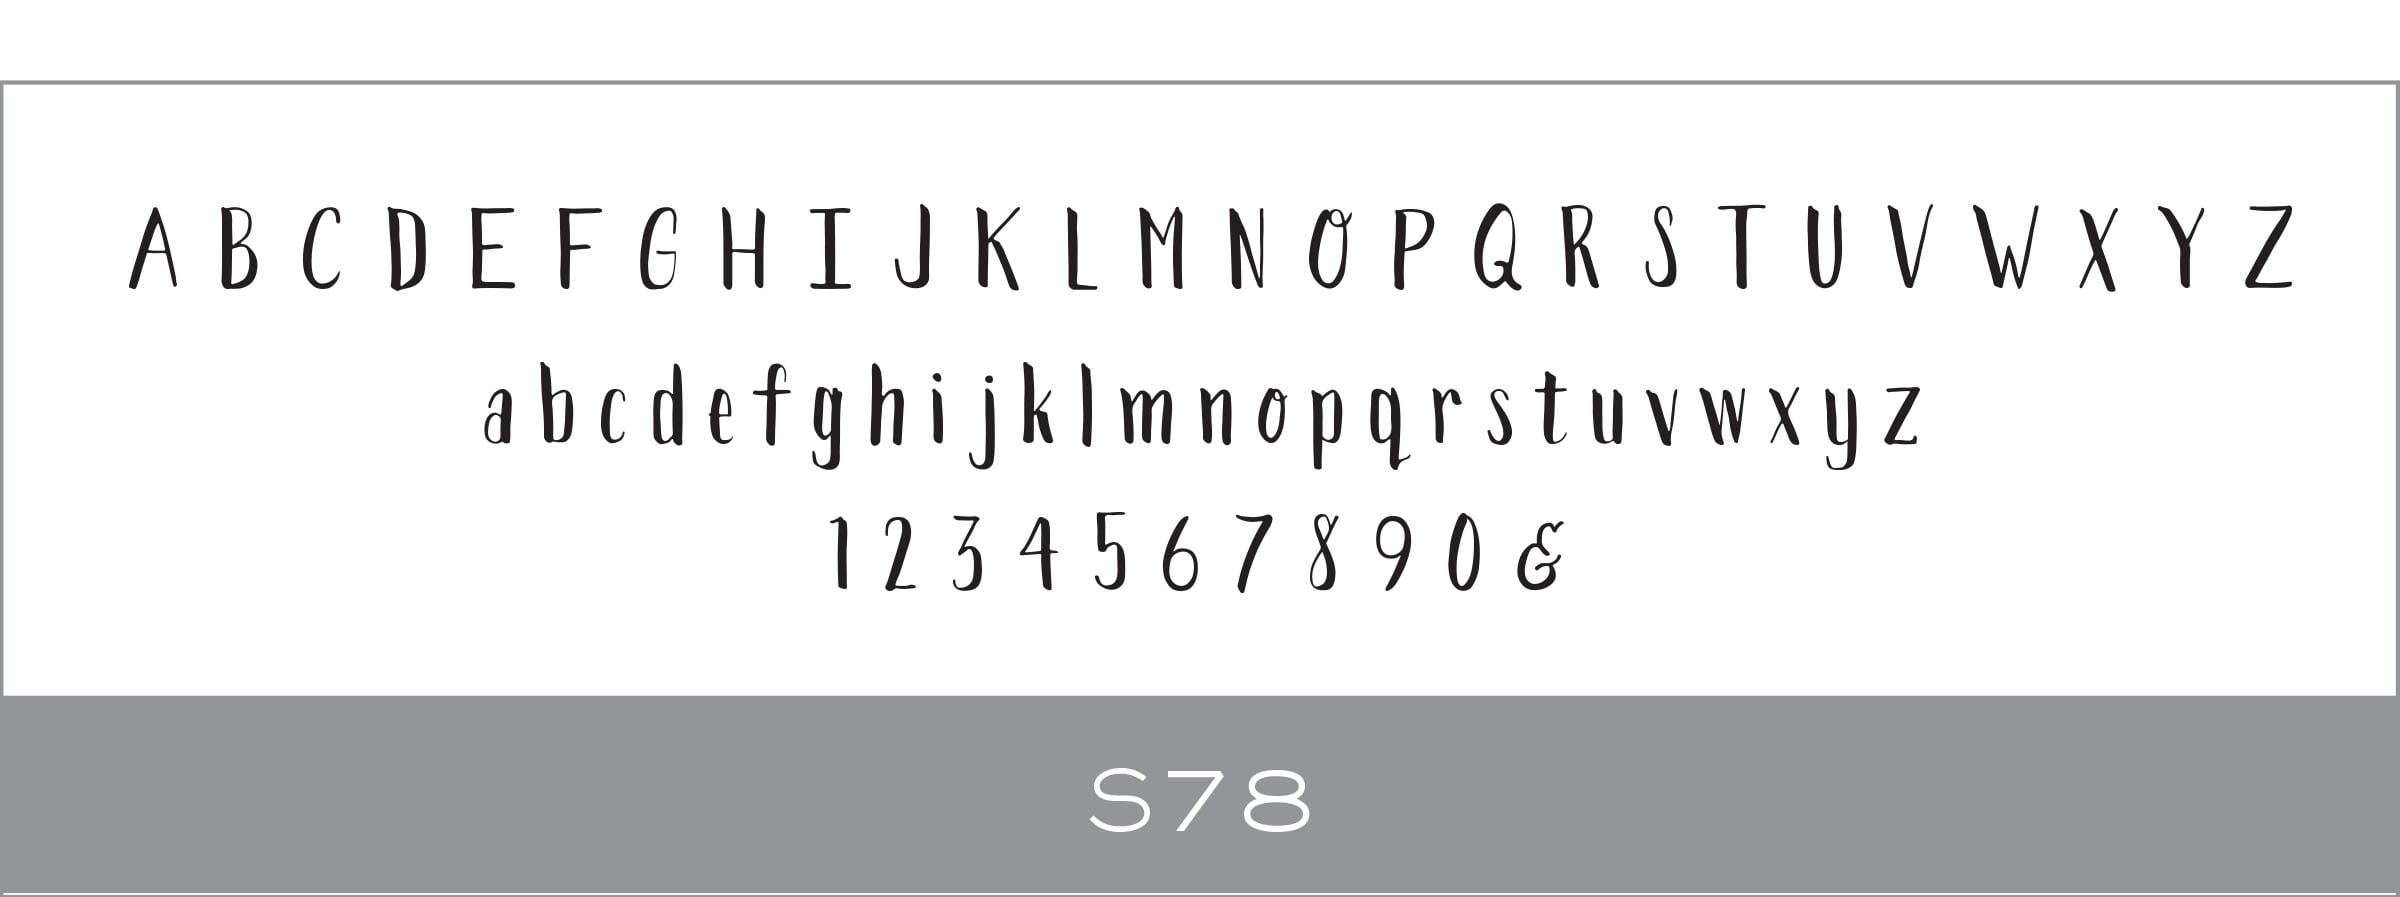 S78_Haute_Papier_Font.jpg